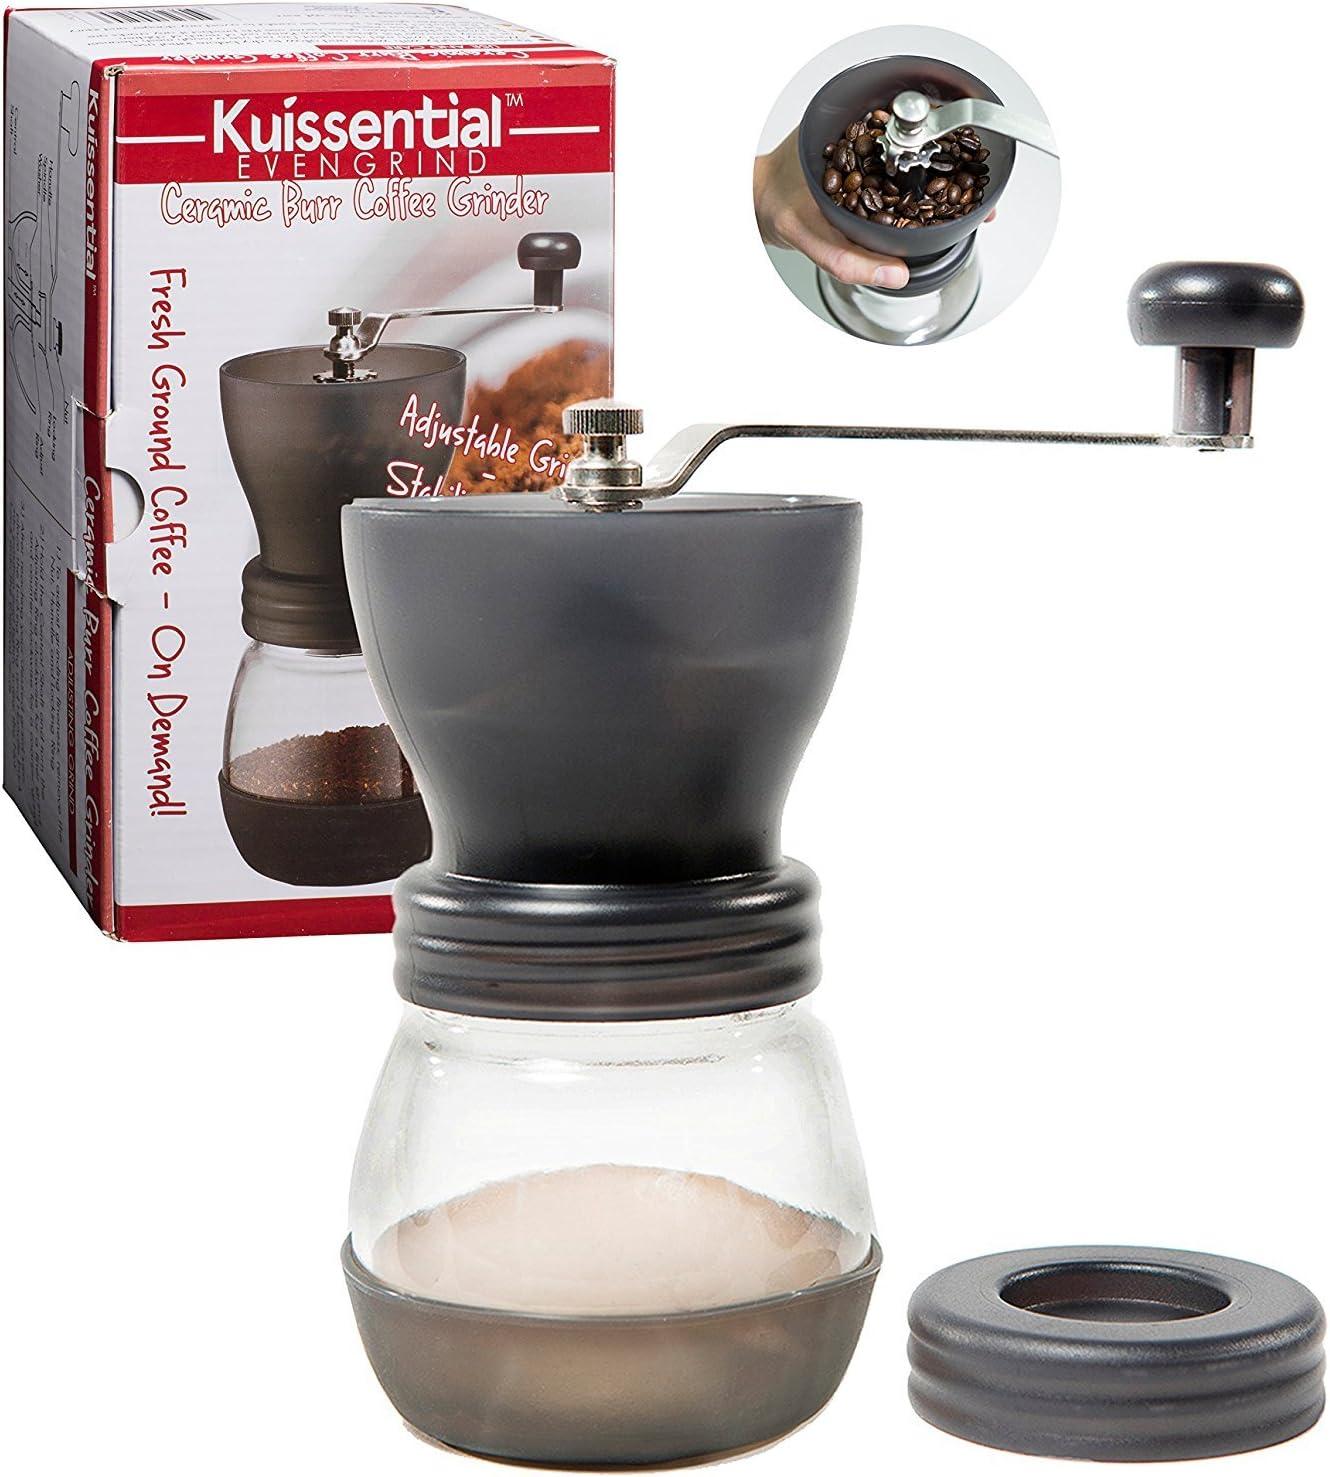 Manual Coffee Burr Grinder- The w EvenGrind Patented Finally resale start Super Special SALE held Original St